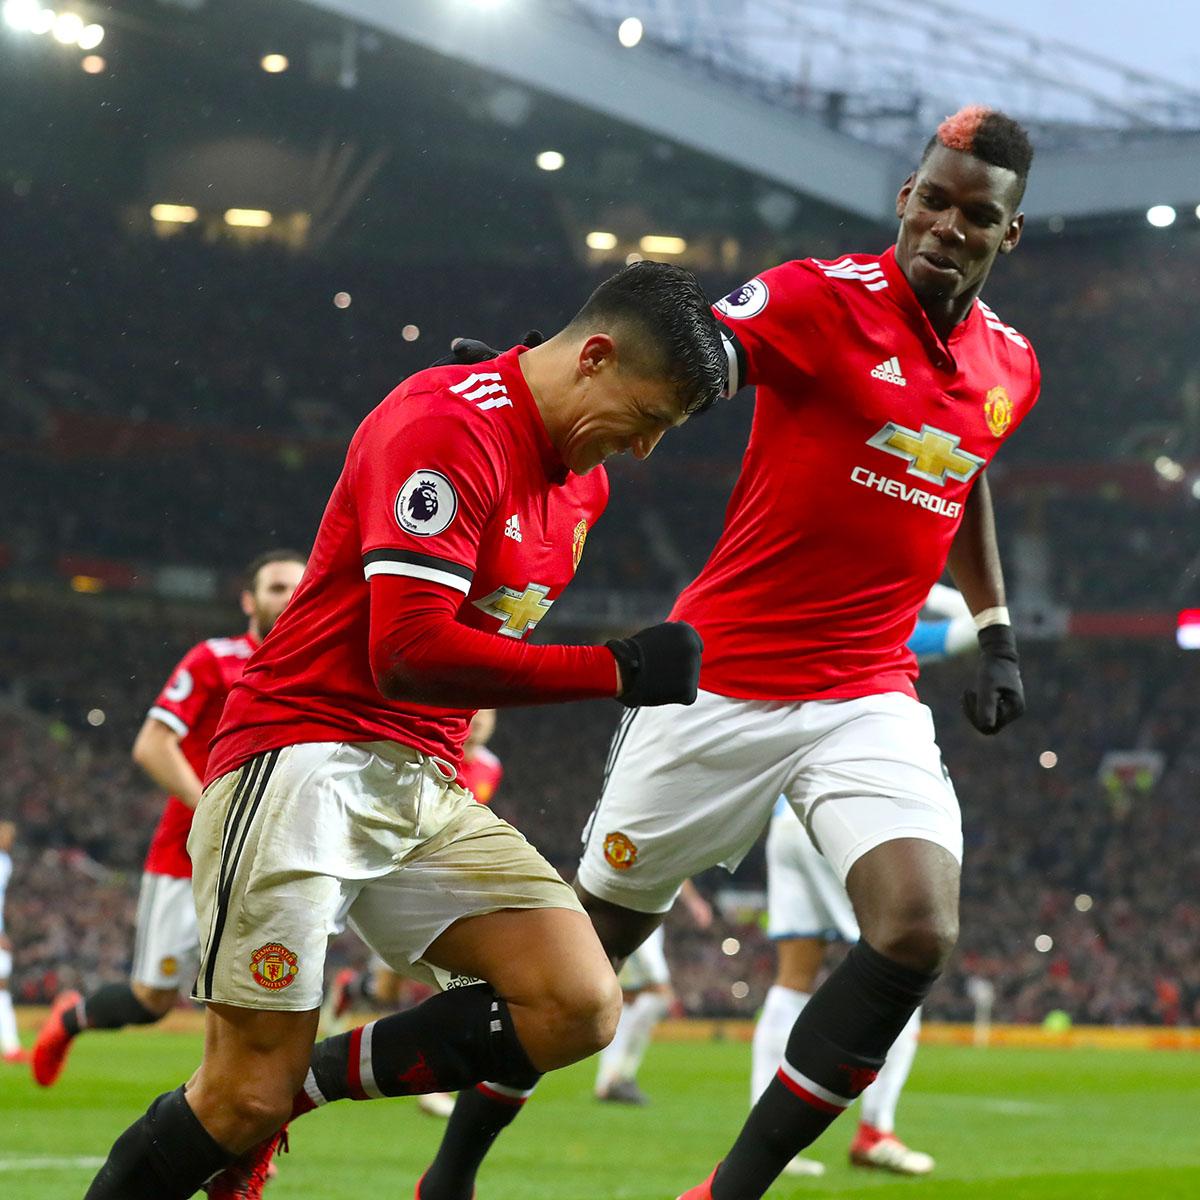 Manchester United - Arsenal FC (ma. 30 september 2019)